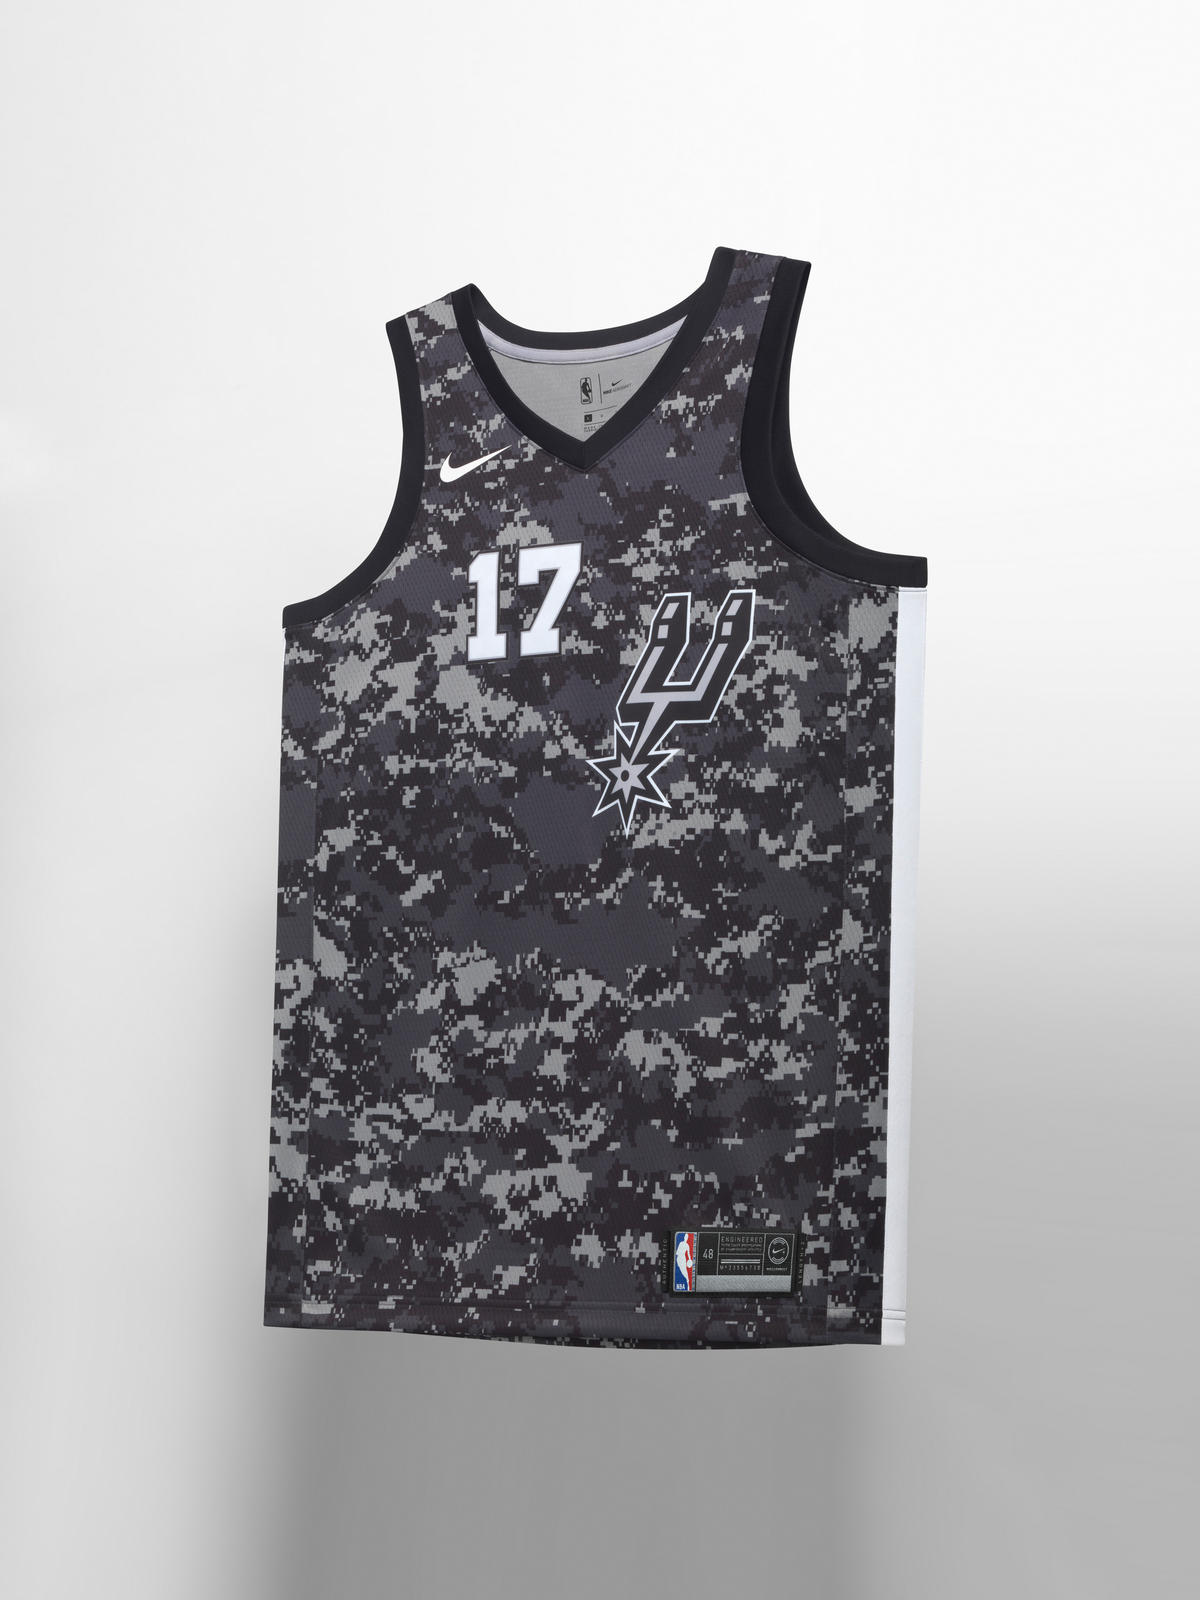 Nike_NBA_City_Edition_Uniform_San_Antonio_Spurs_0146_native_1600